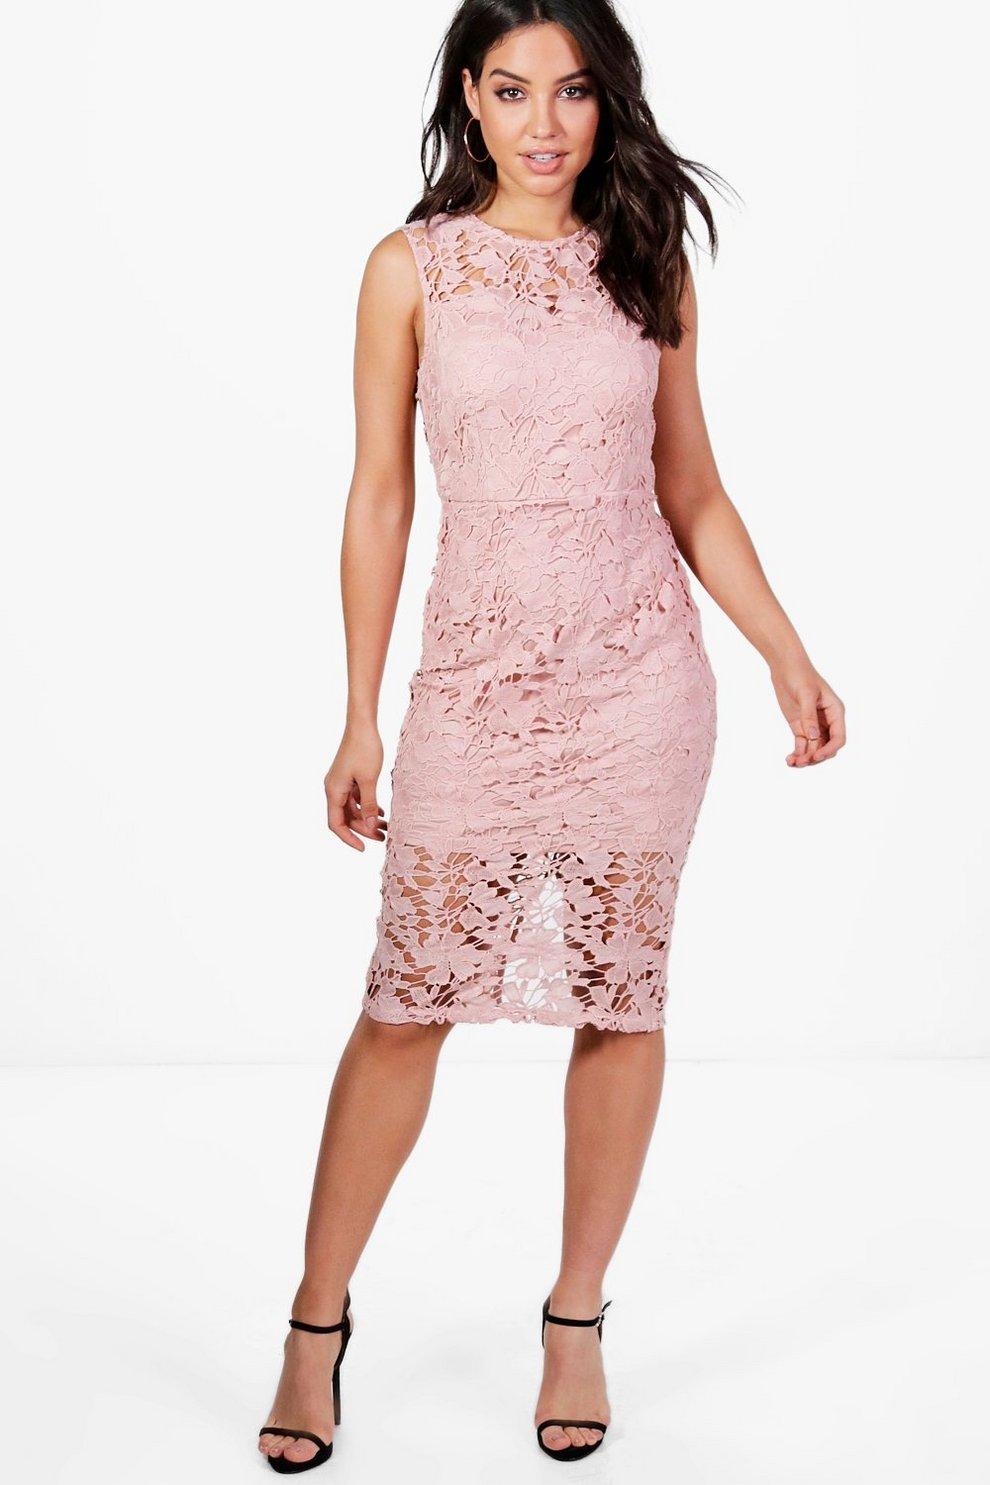 c08dd5b6fa57 Boutique Eleanor Lace Sleeveless Midi Dress